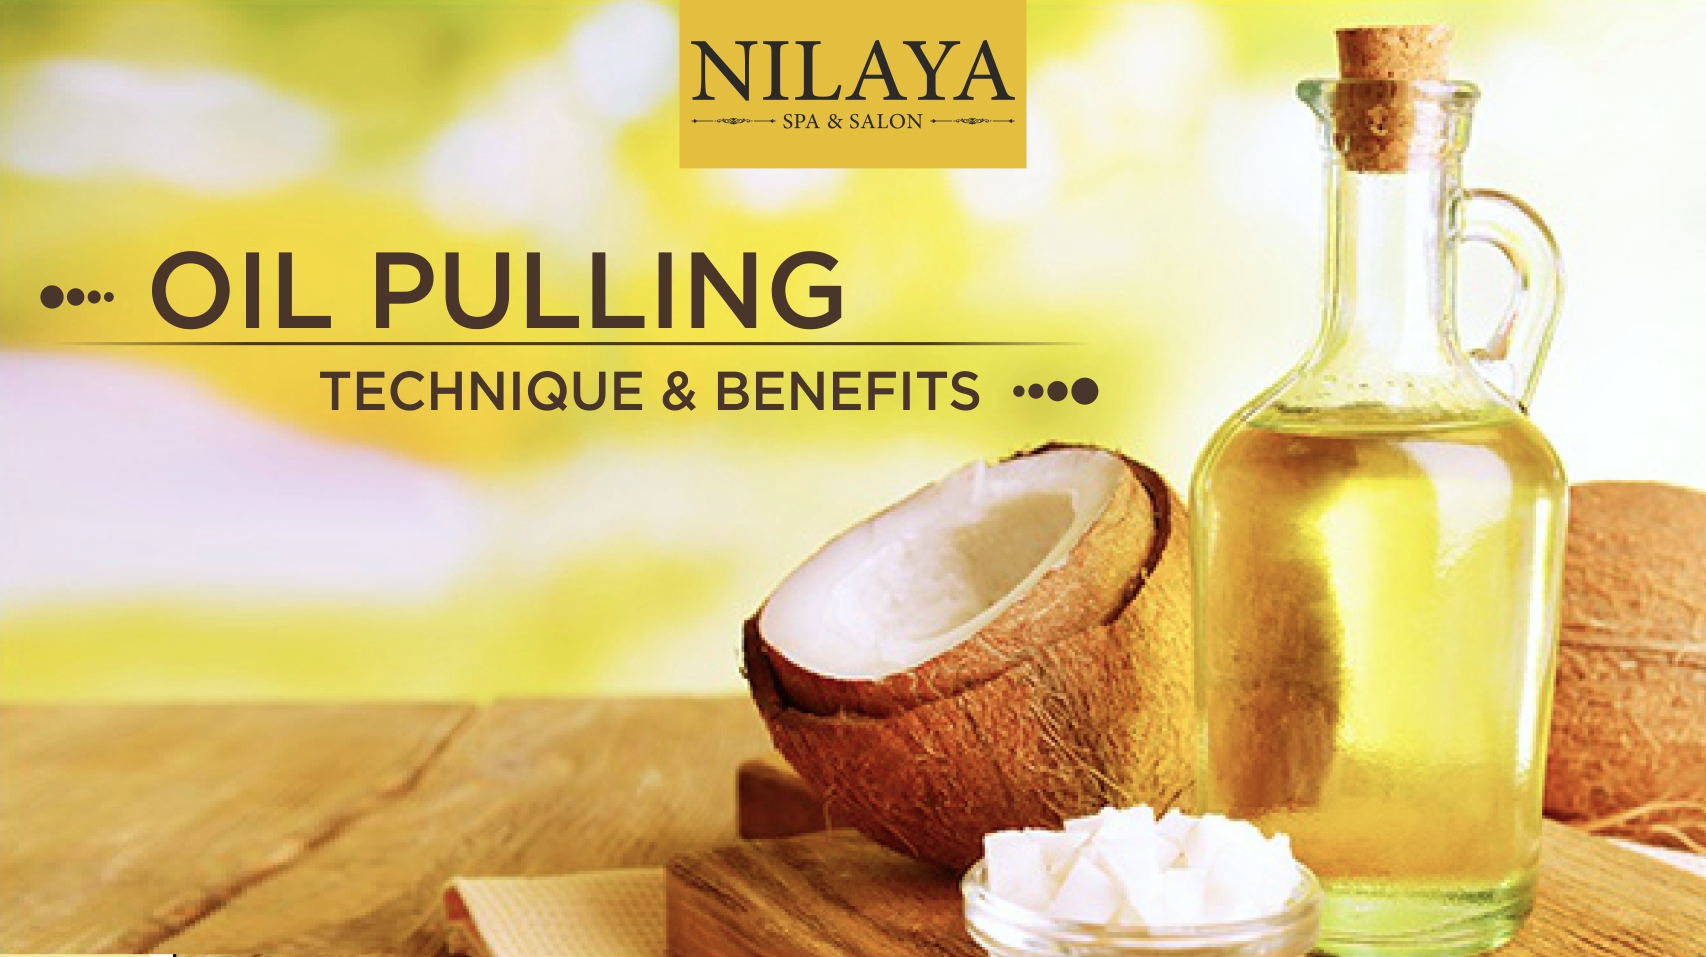 Oil pulling technique & Benefits